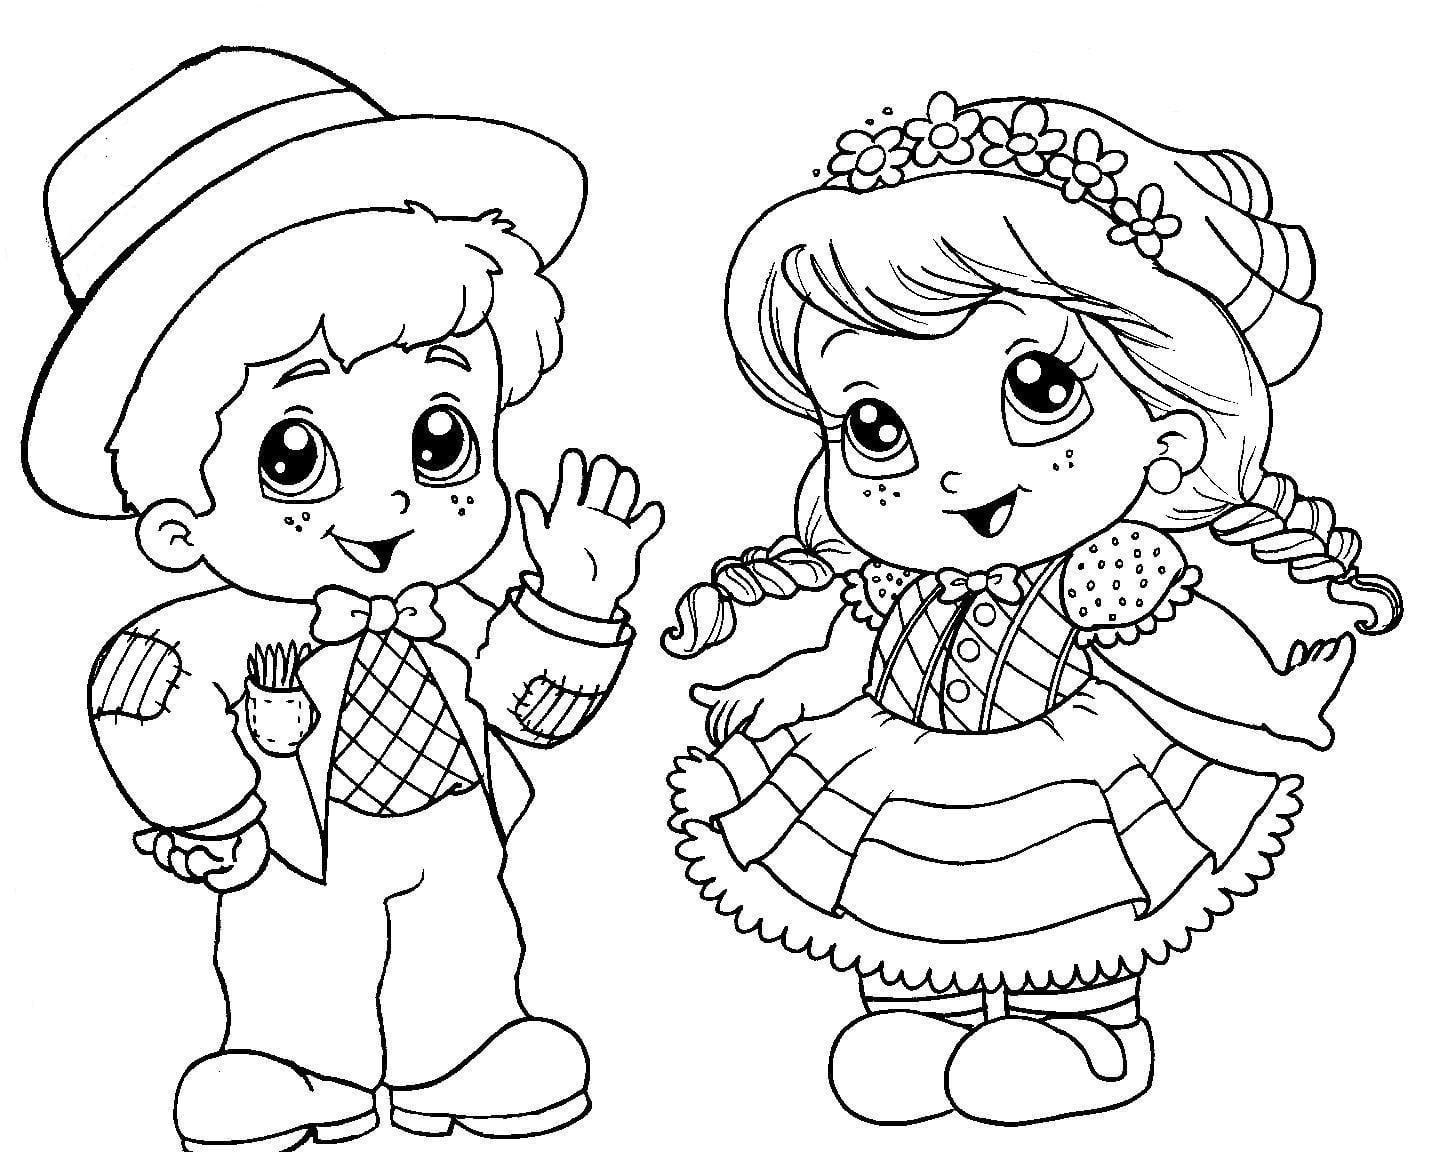 Desenhos De Bonecos Para Colorir – Pampekids Net